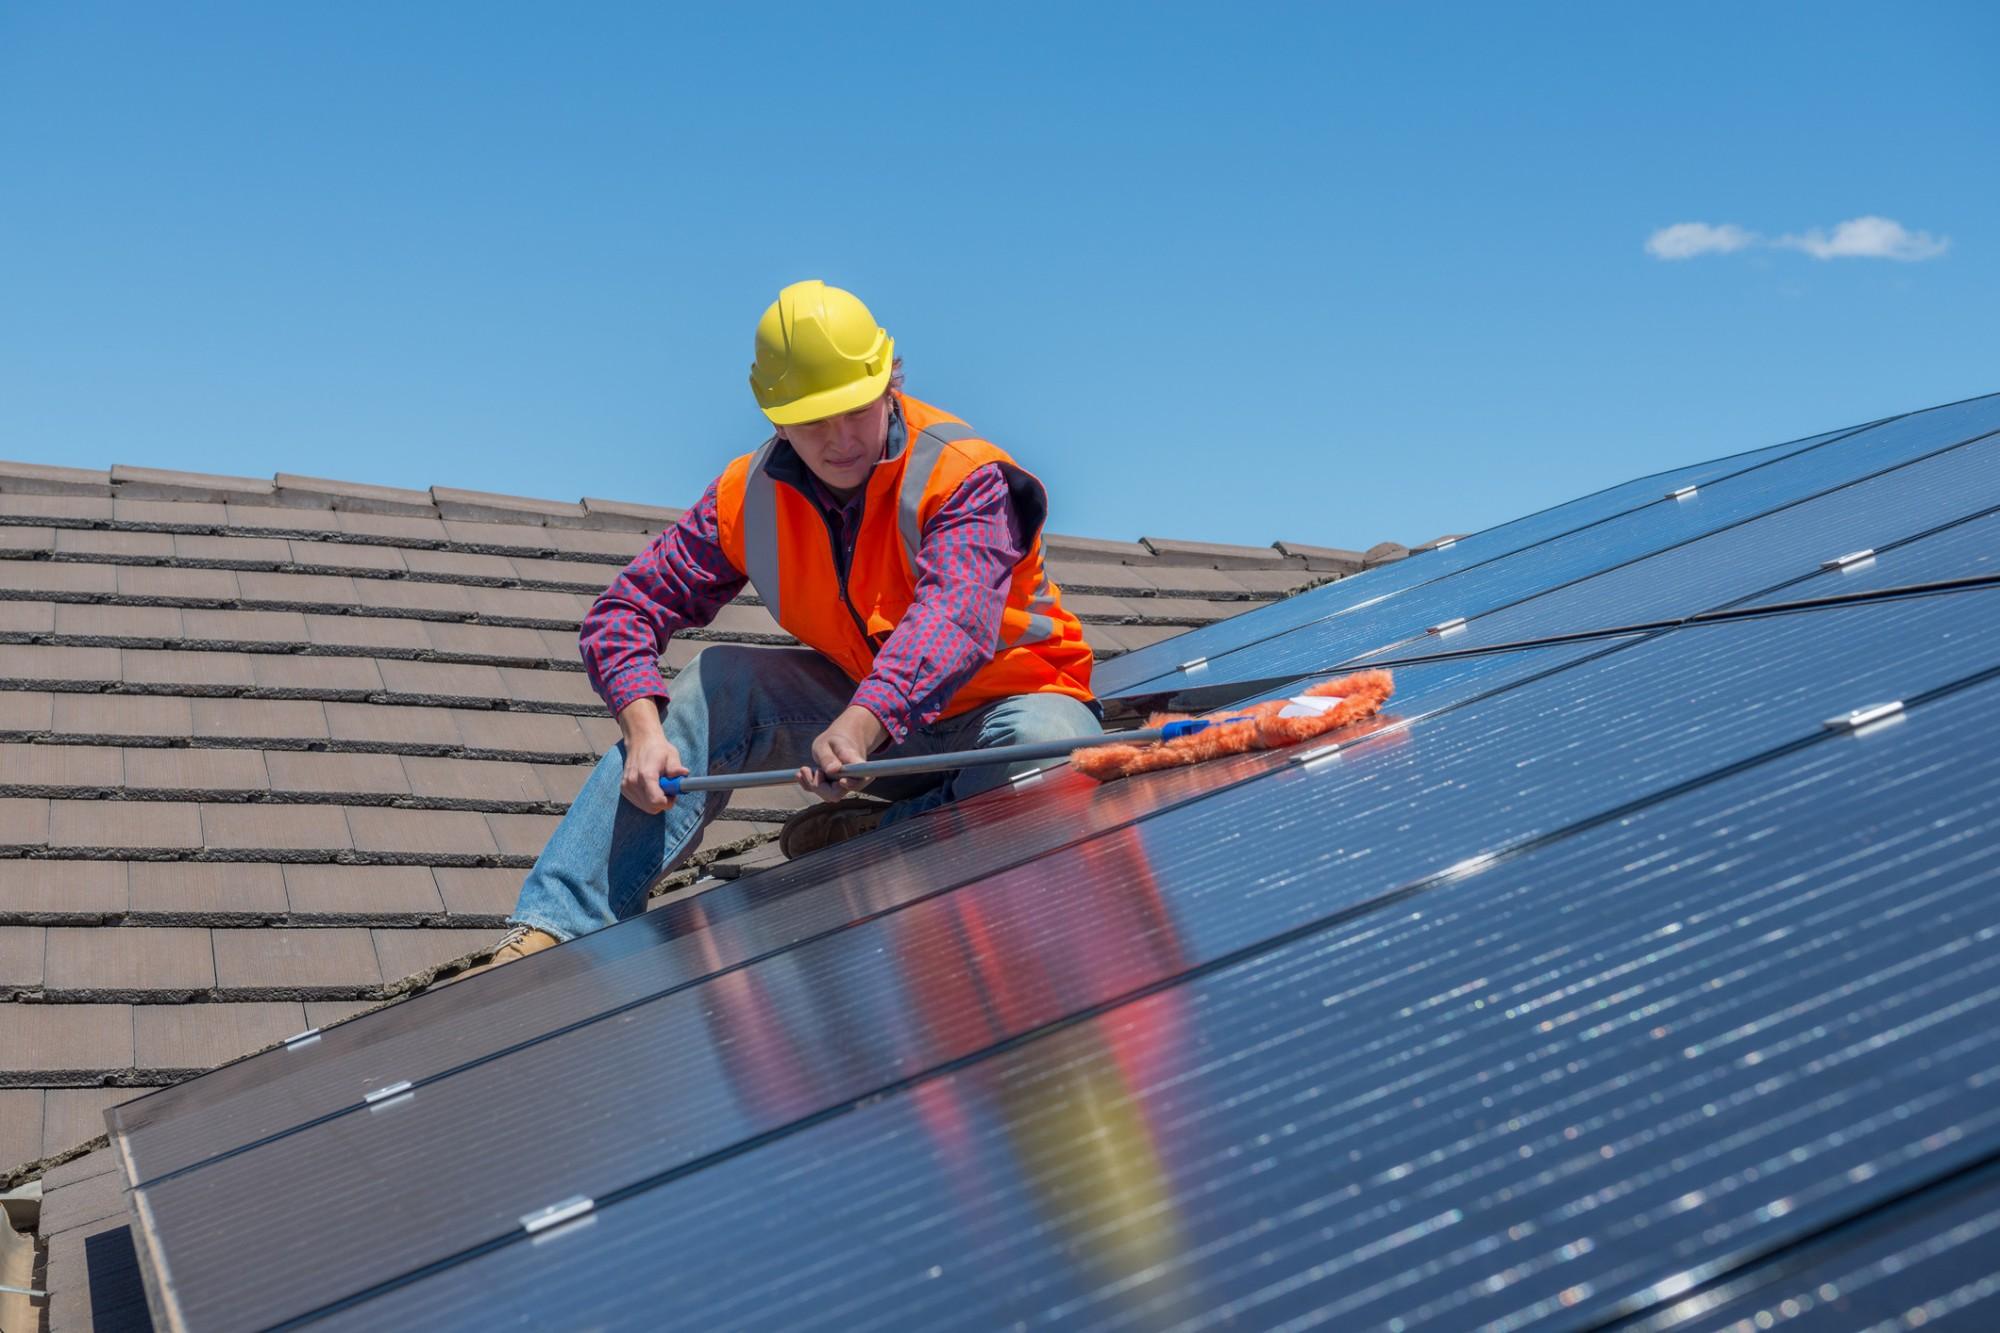 Saiba mais a respeito da durabilidade do painel solar!